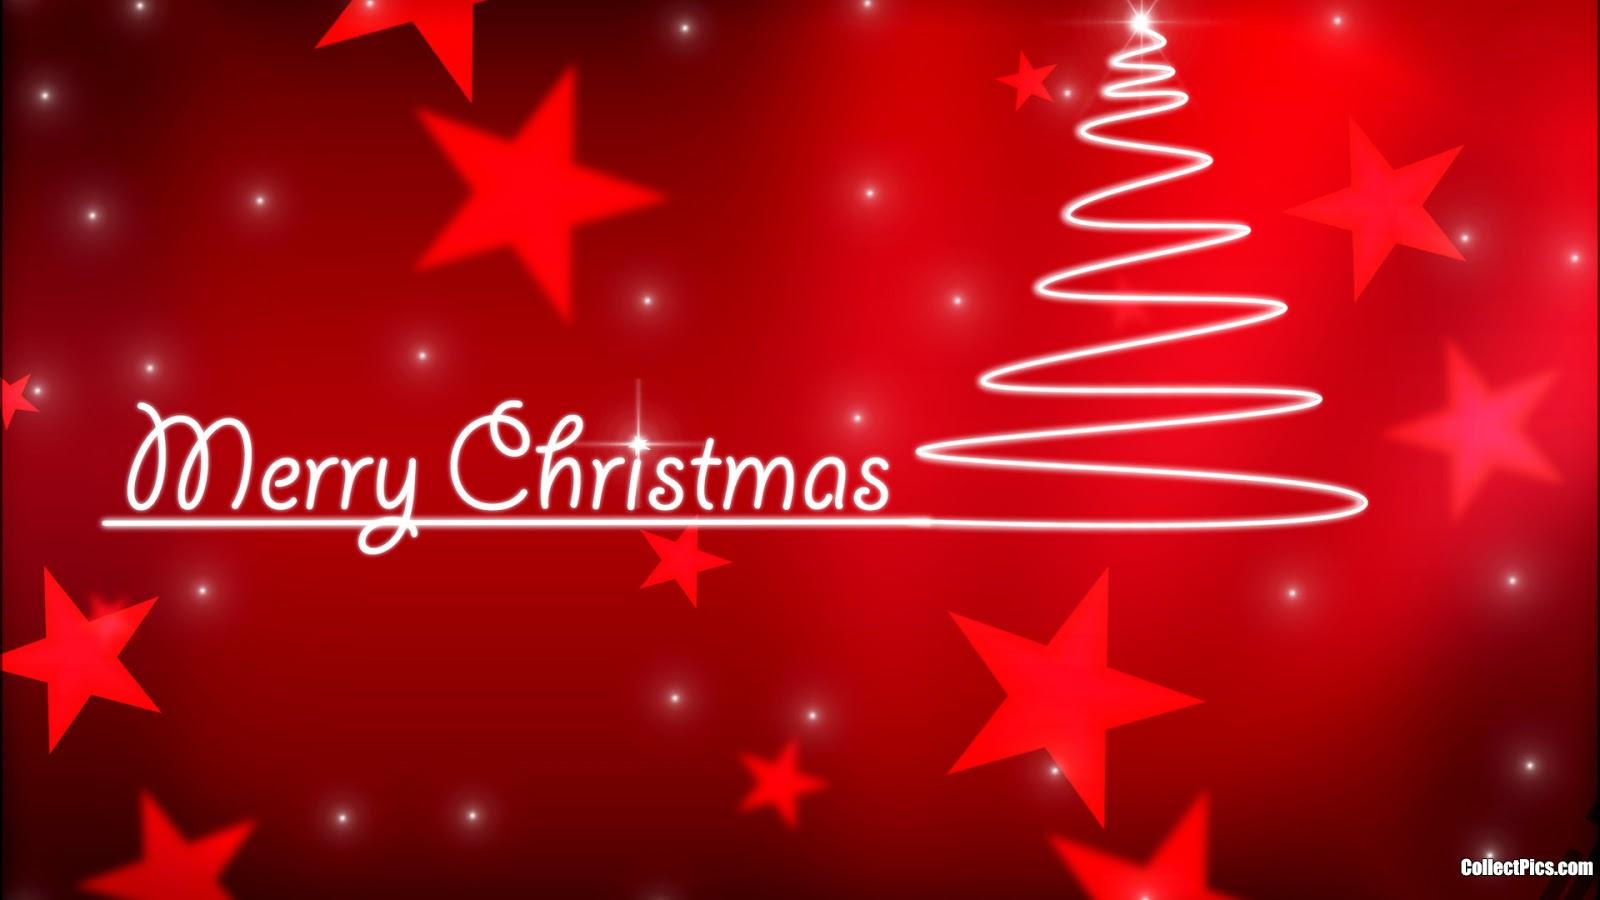 Christmas Tree Holiday Wallpaper 1920x1080 1600x900